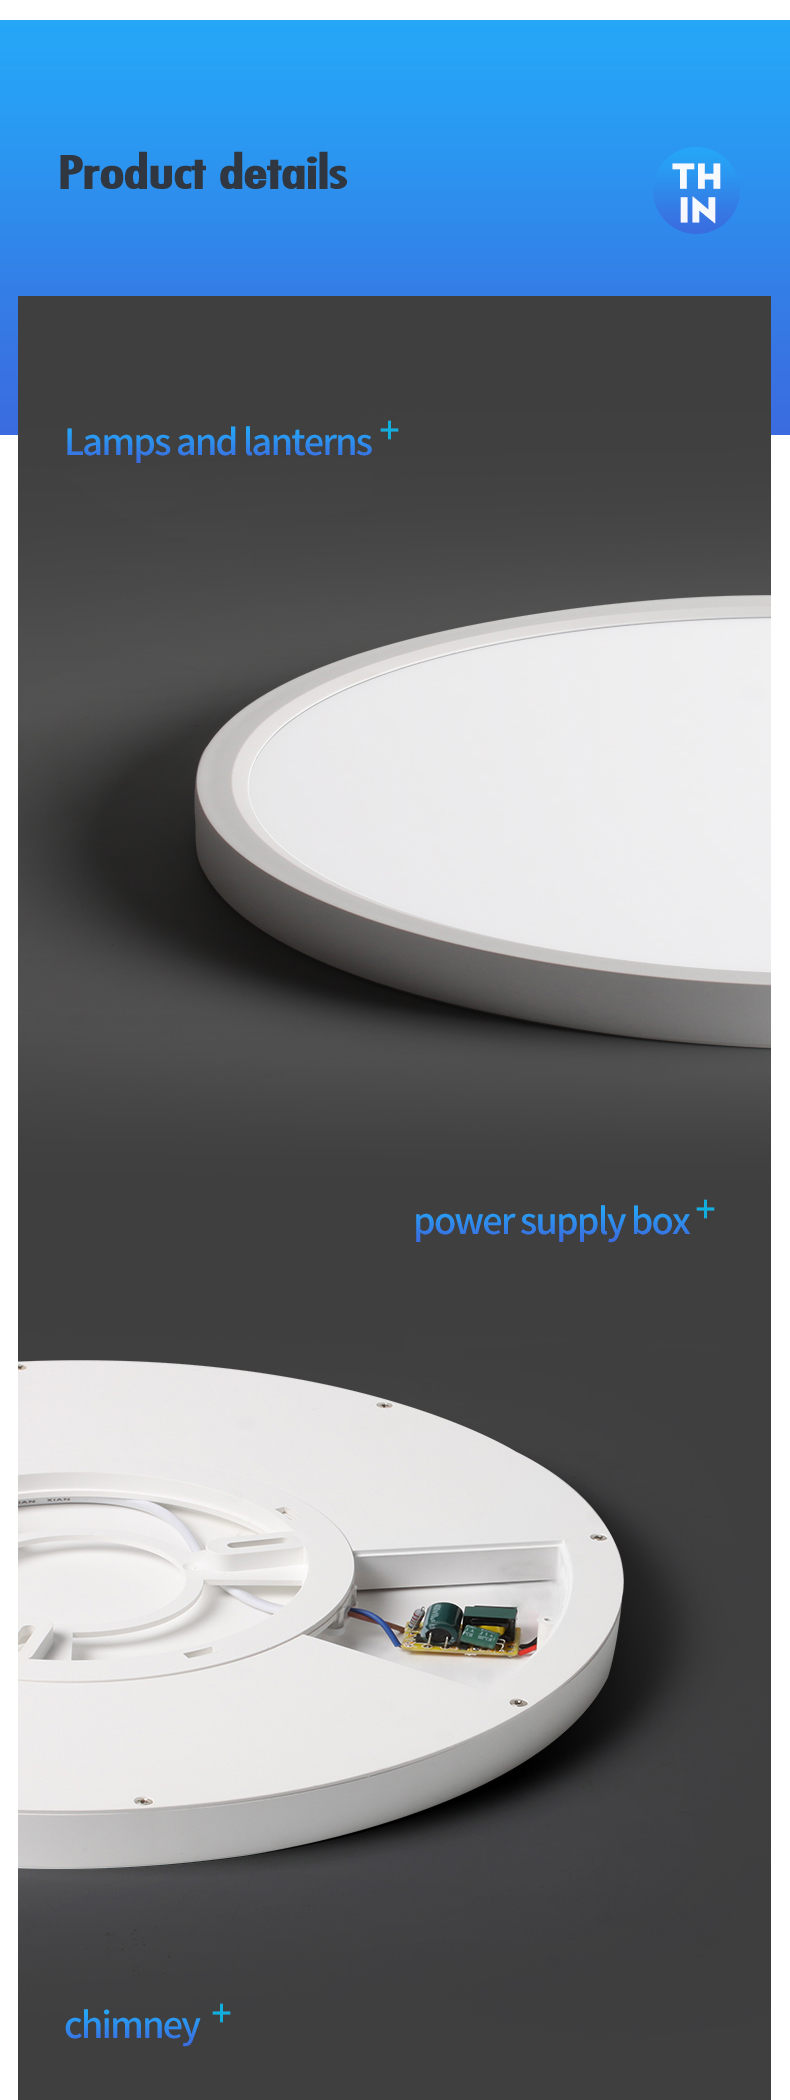 H95416e64ddd44efc9c868bf7087cebc5f Modern LED Ceiling Light 12W 18W 24W 32W 220V 5000K Kitchen Bedroom Bathroom Lamps Ultrathin Ceiling Lamp